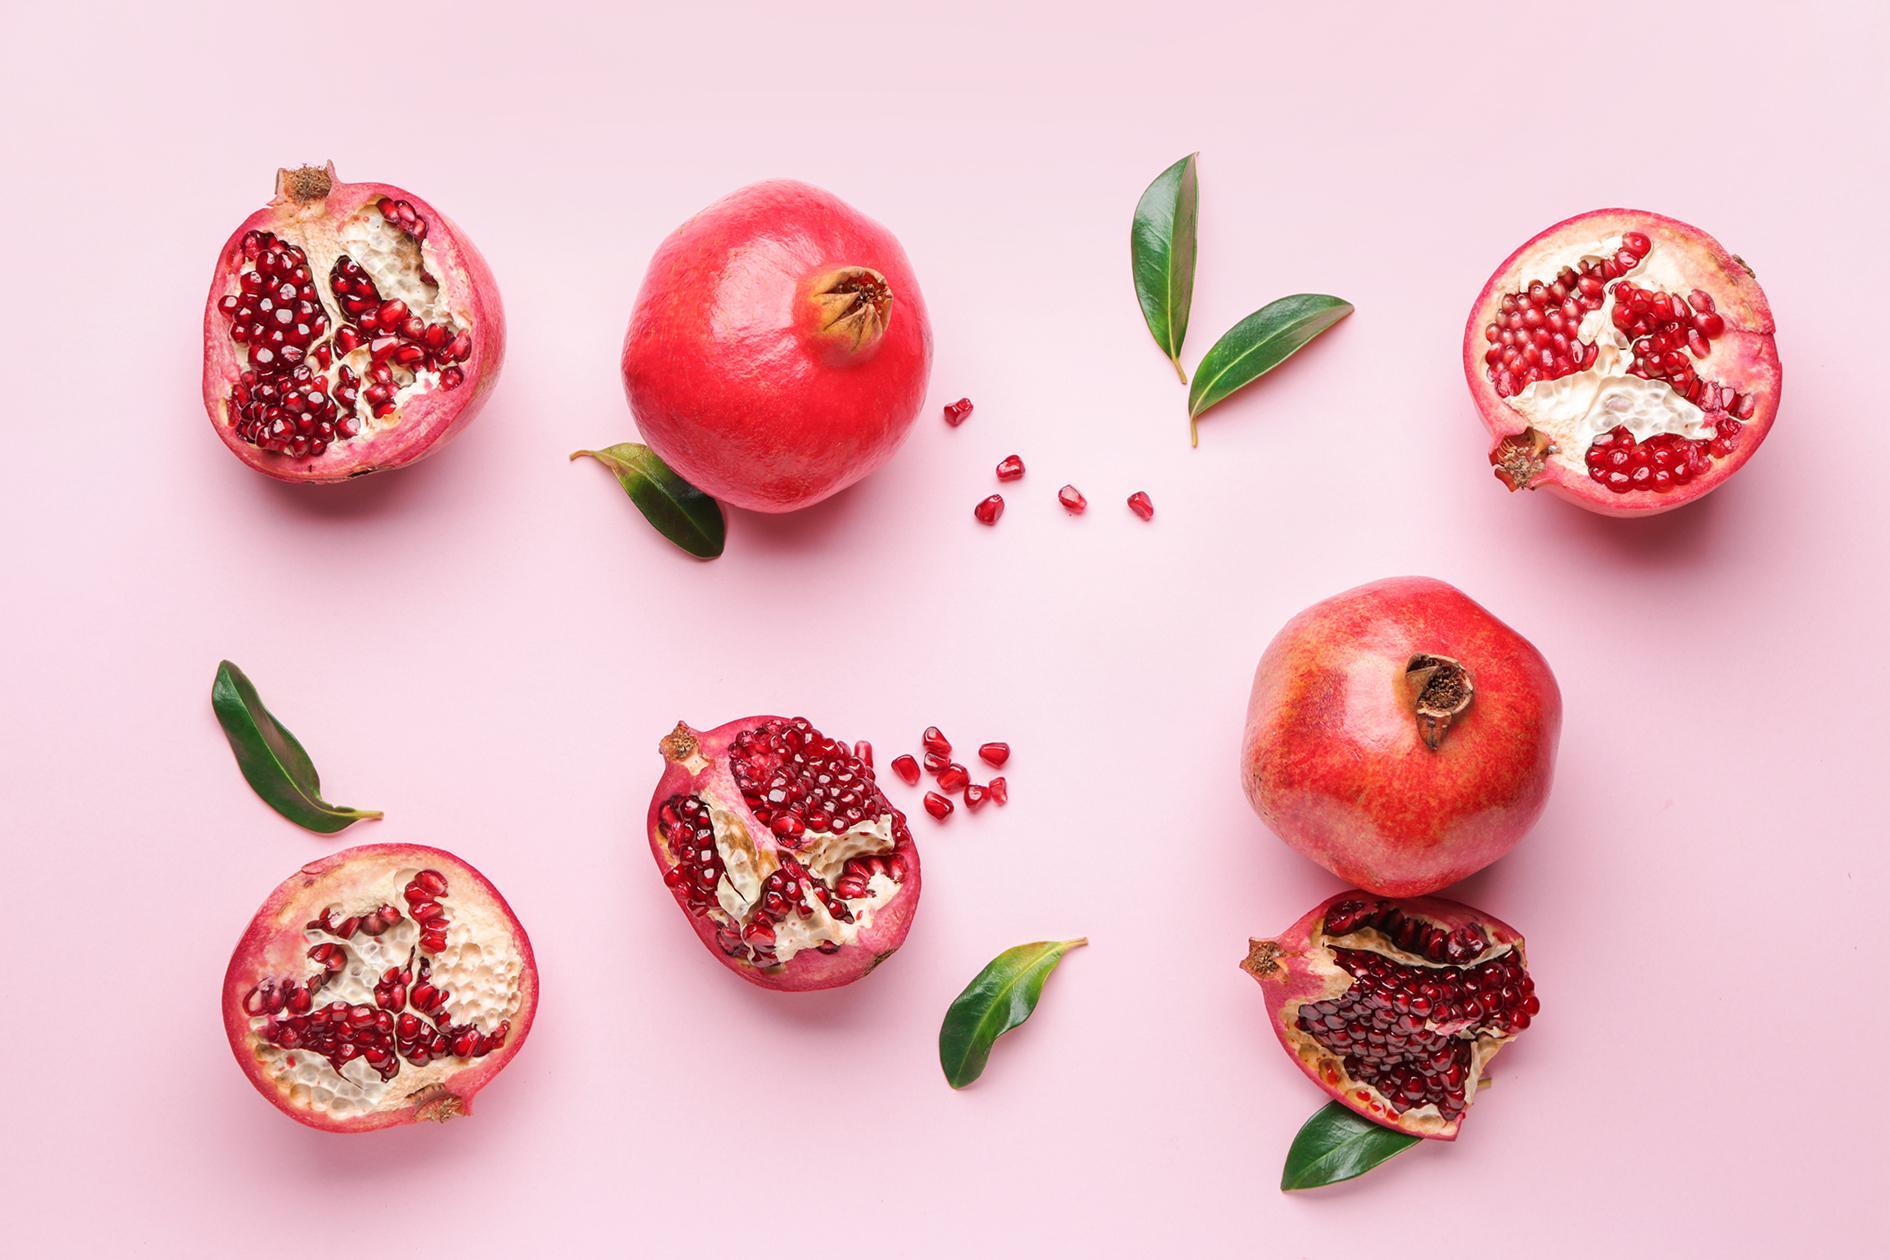 Powerfrucht Granatapfel Jungborn